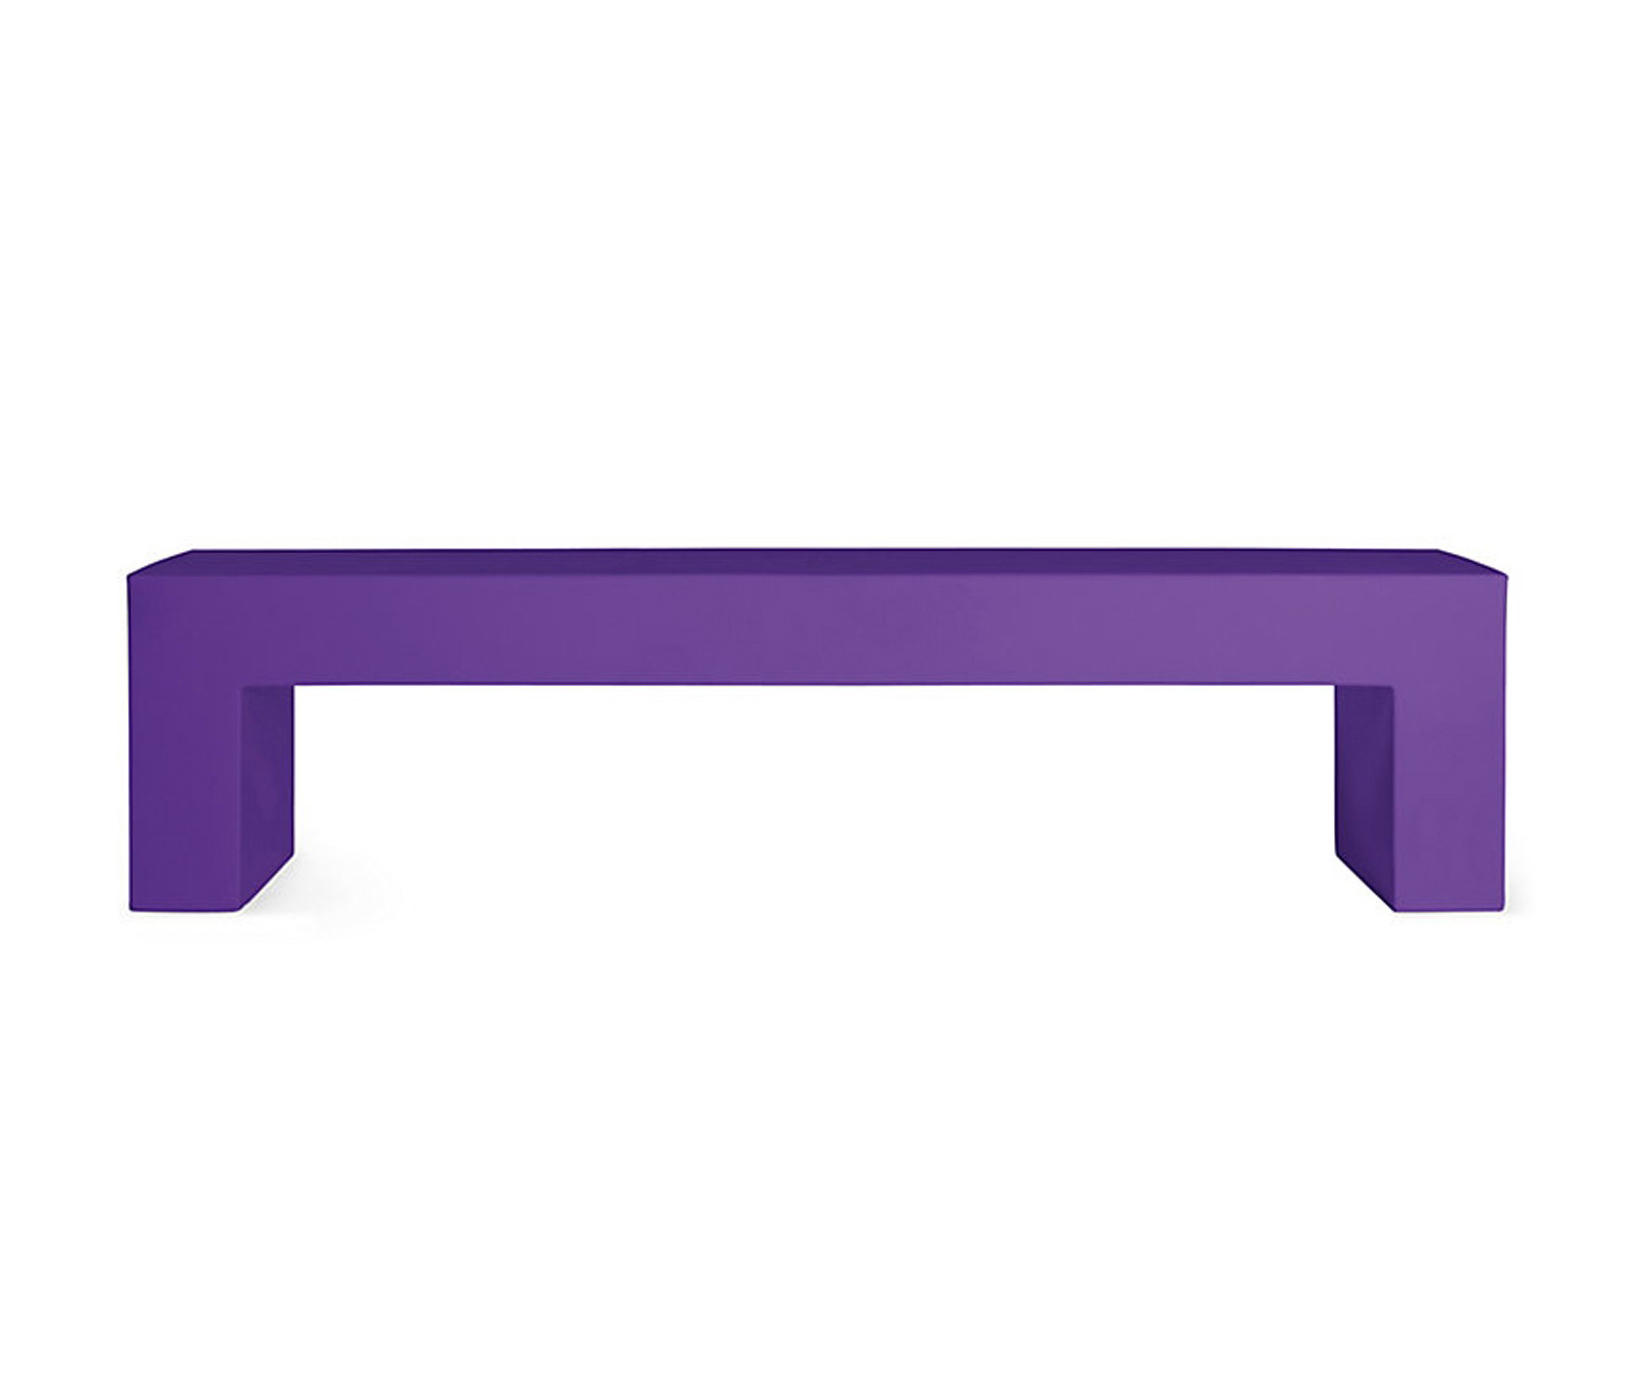 baxton hannah the benches blue purple bench light hd studio depot home bedroom p